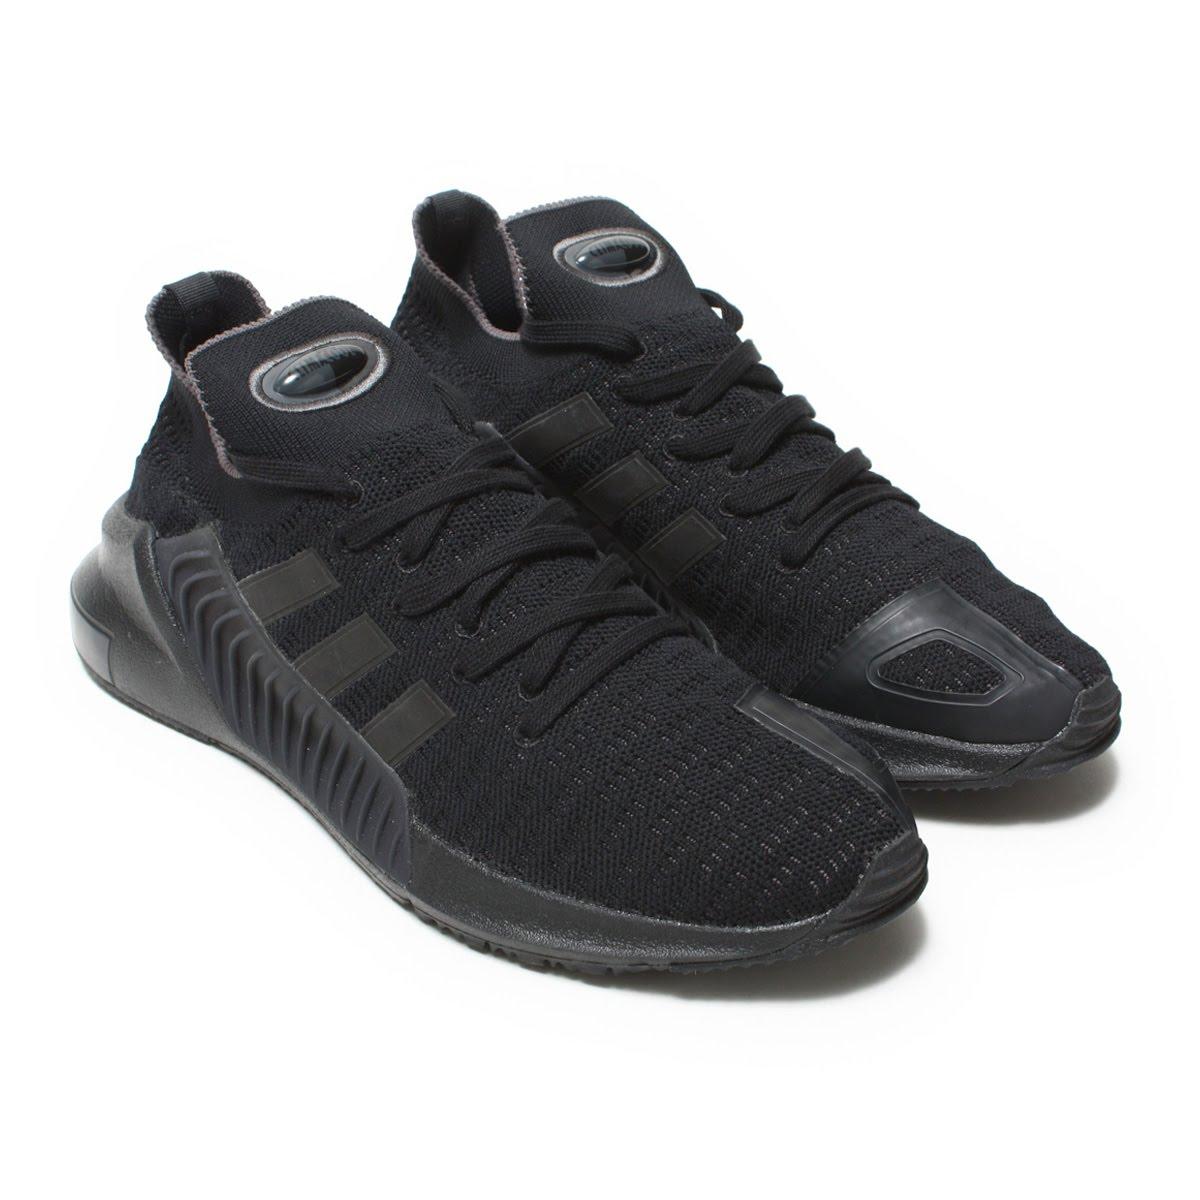 pretty nice 8039c 1d72c adidas Originals CLIMACOOL 02/17 PK (アディダスオリジナルスクライマクール 02/17 PK)  18SS-ICore Black/Core Black/Grey 18SS-I